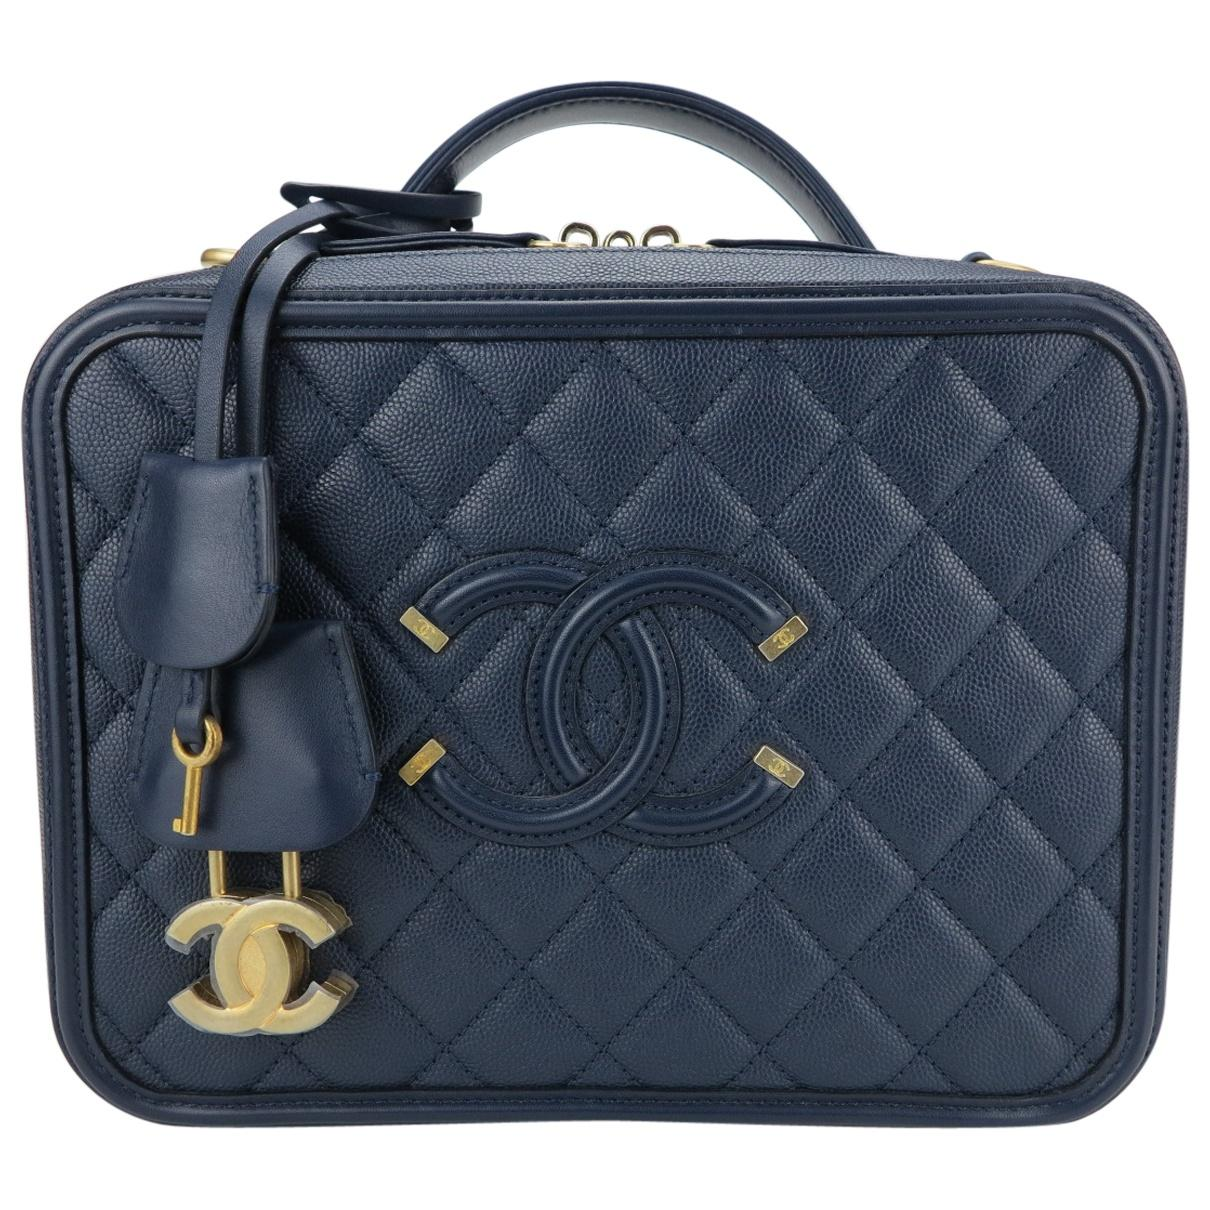 17a4d13dfba7 Chanel. Women s Blue Vanity Navy Leather Handbag. £3